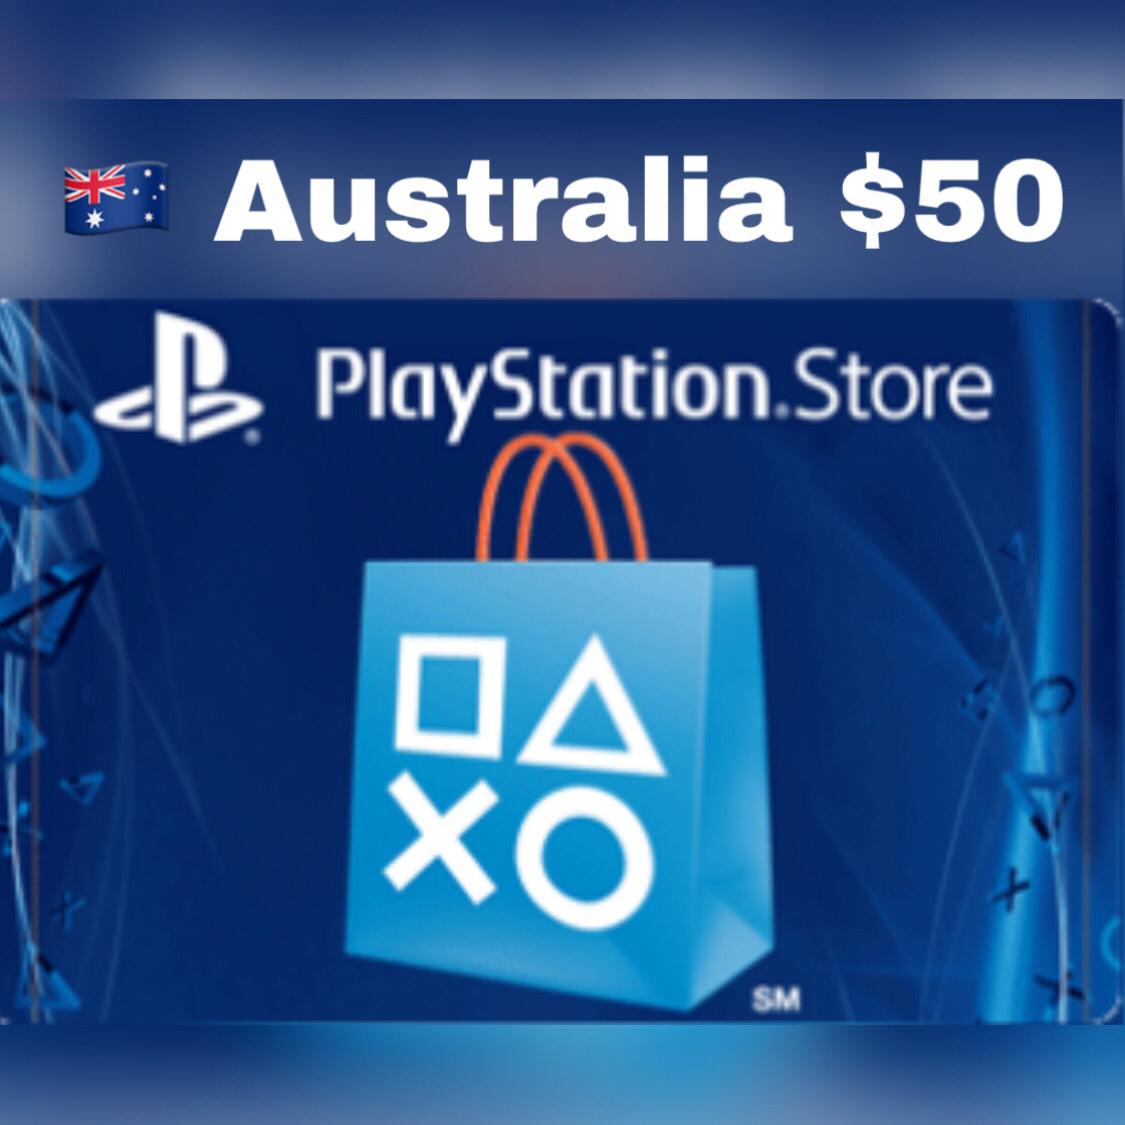 Playstation Network Card Australia $50